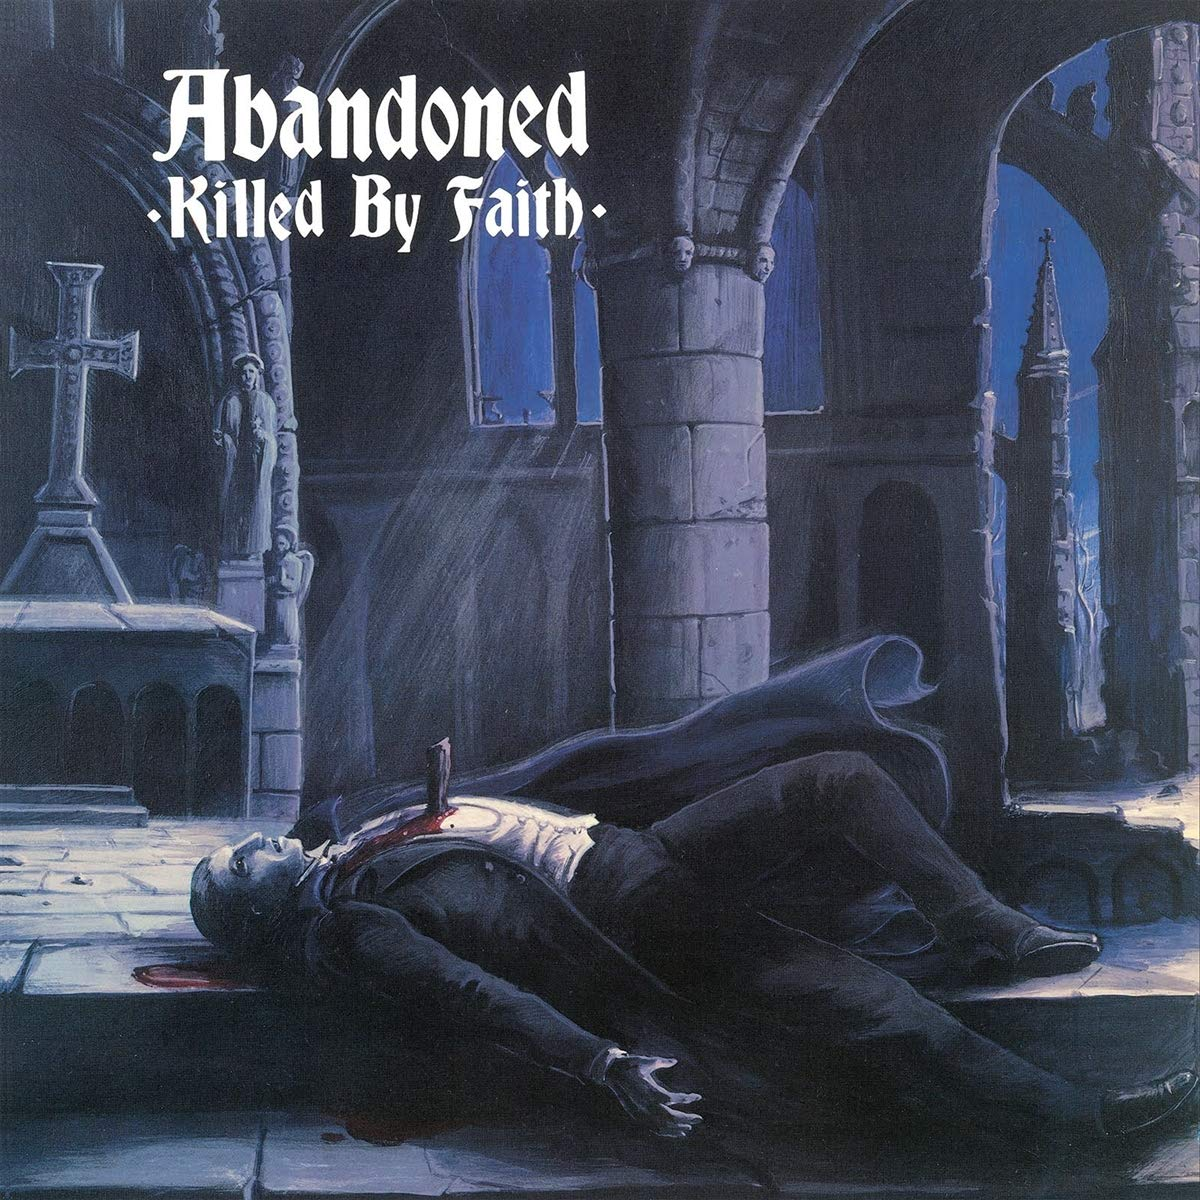 Abandoned - Killed By Faith